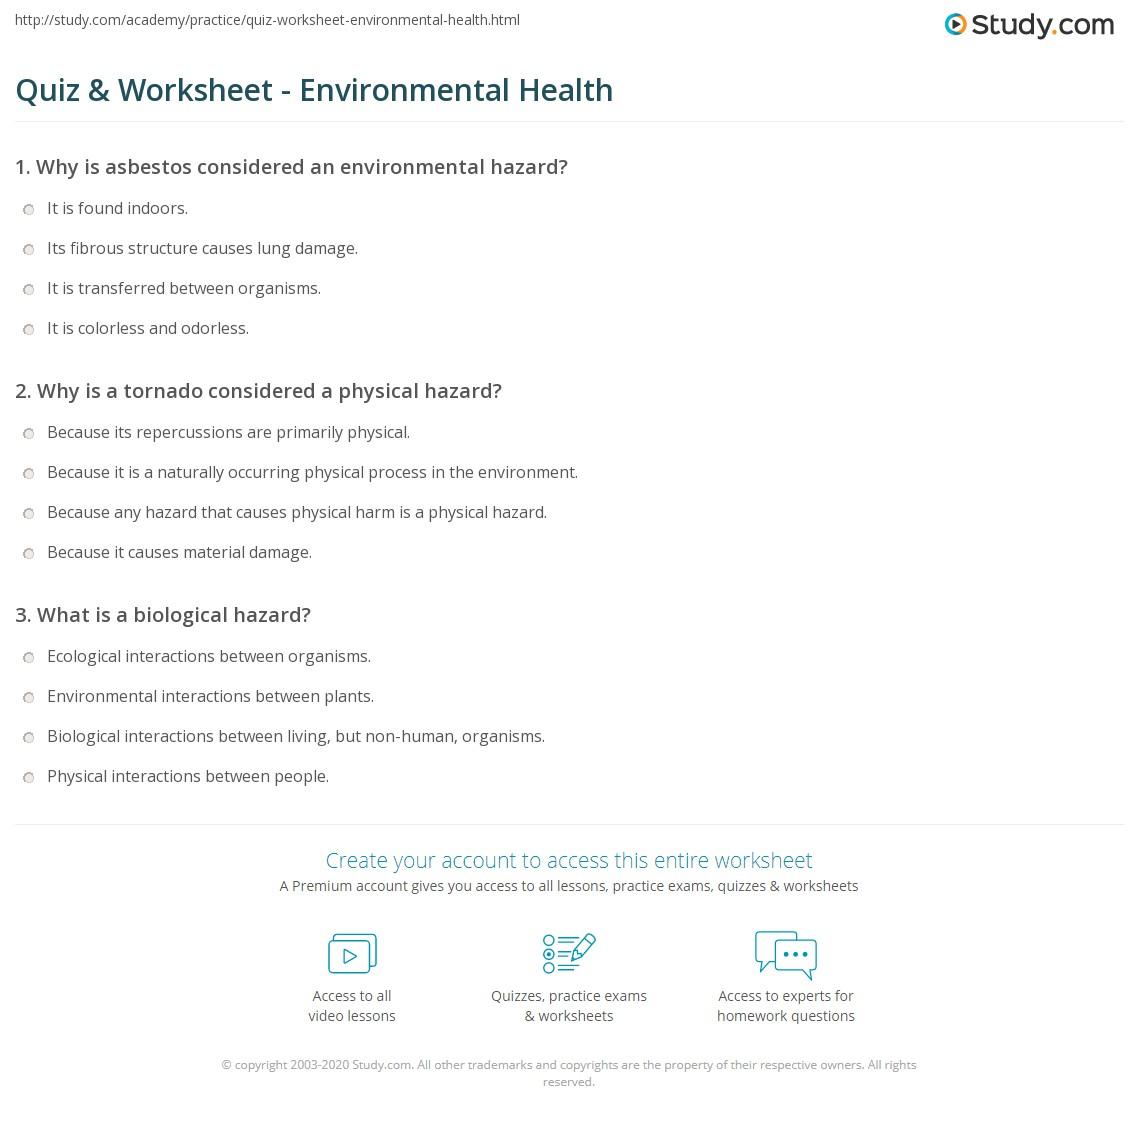 Quiz W Ksheet Envir Ment L He Lth Study